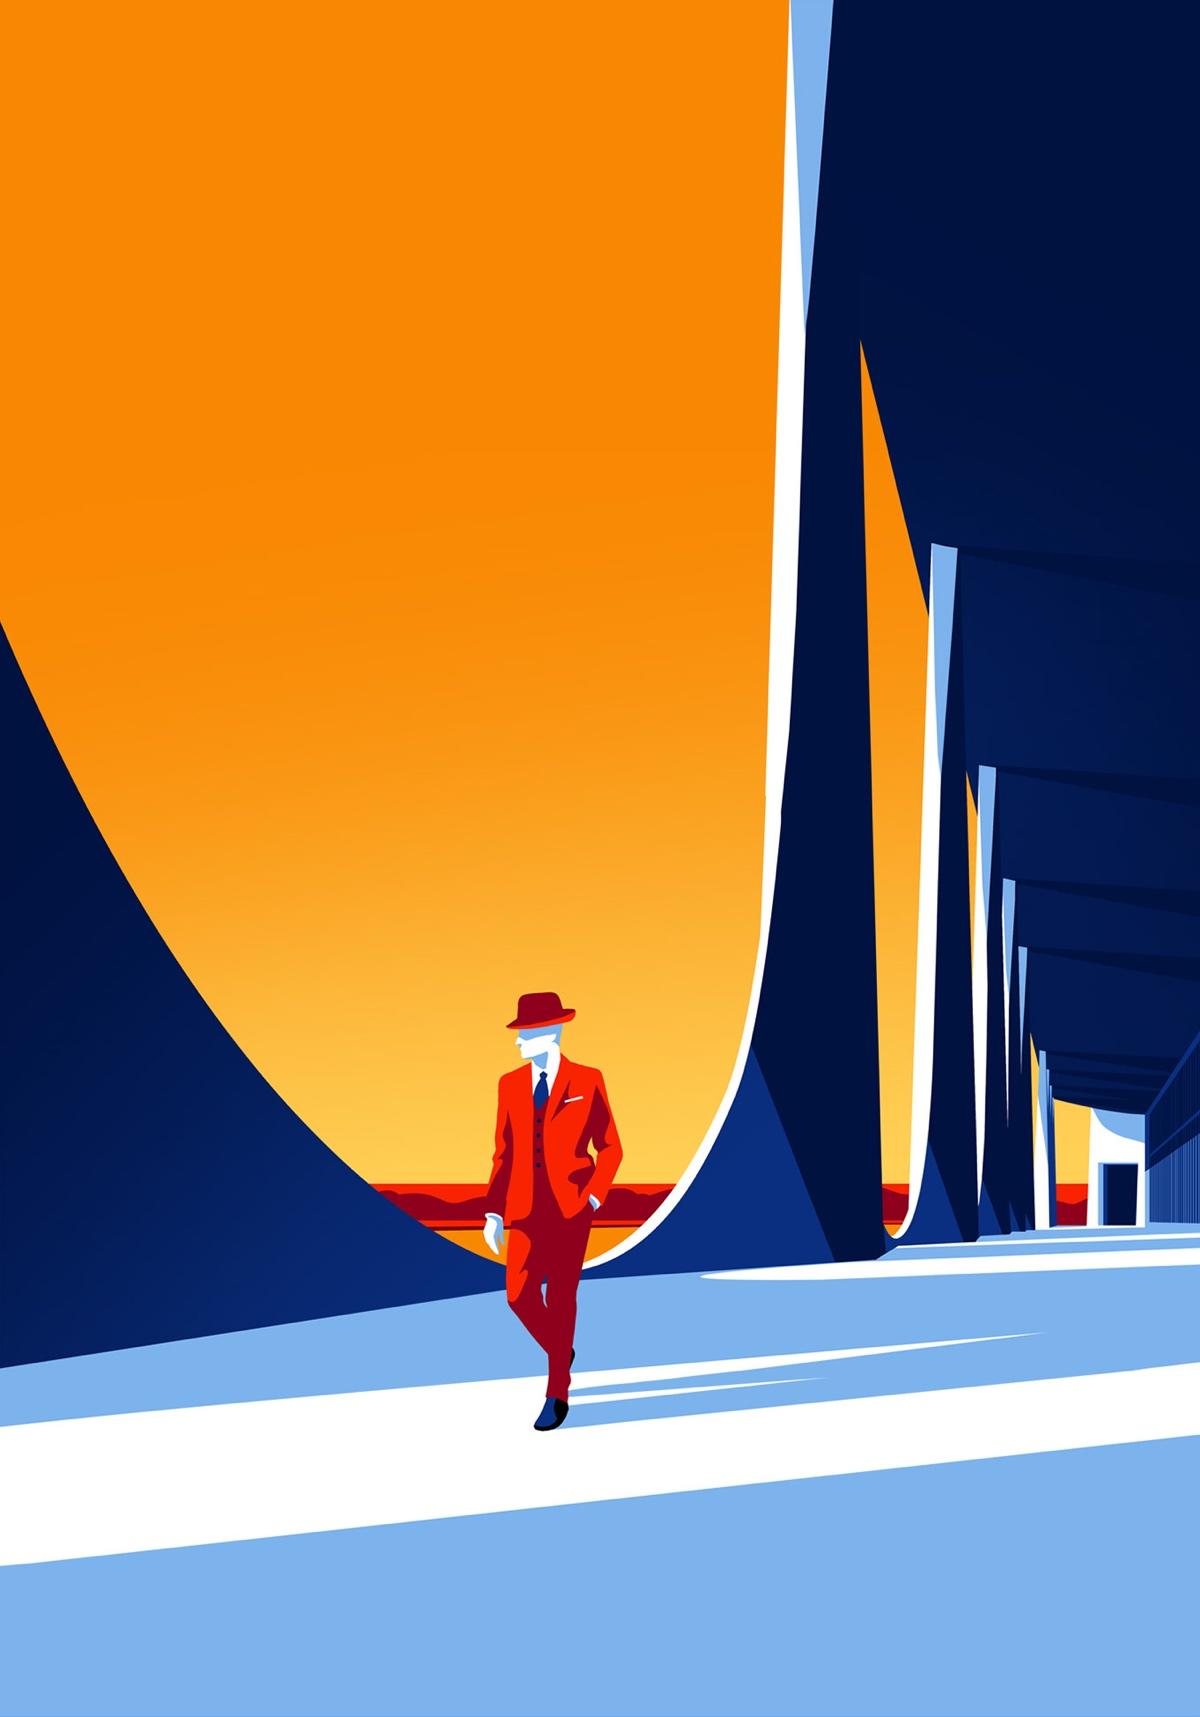 oscar-niemeyer-architecture-illustrations-levente-szabo-11